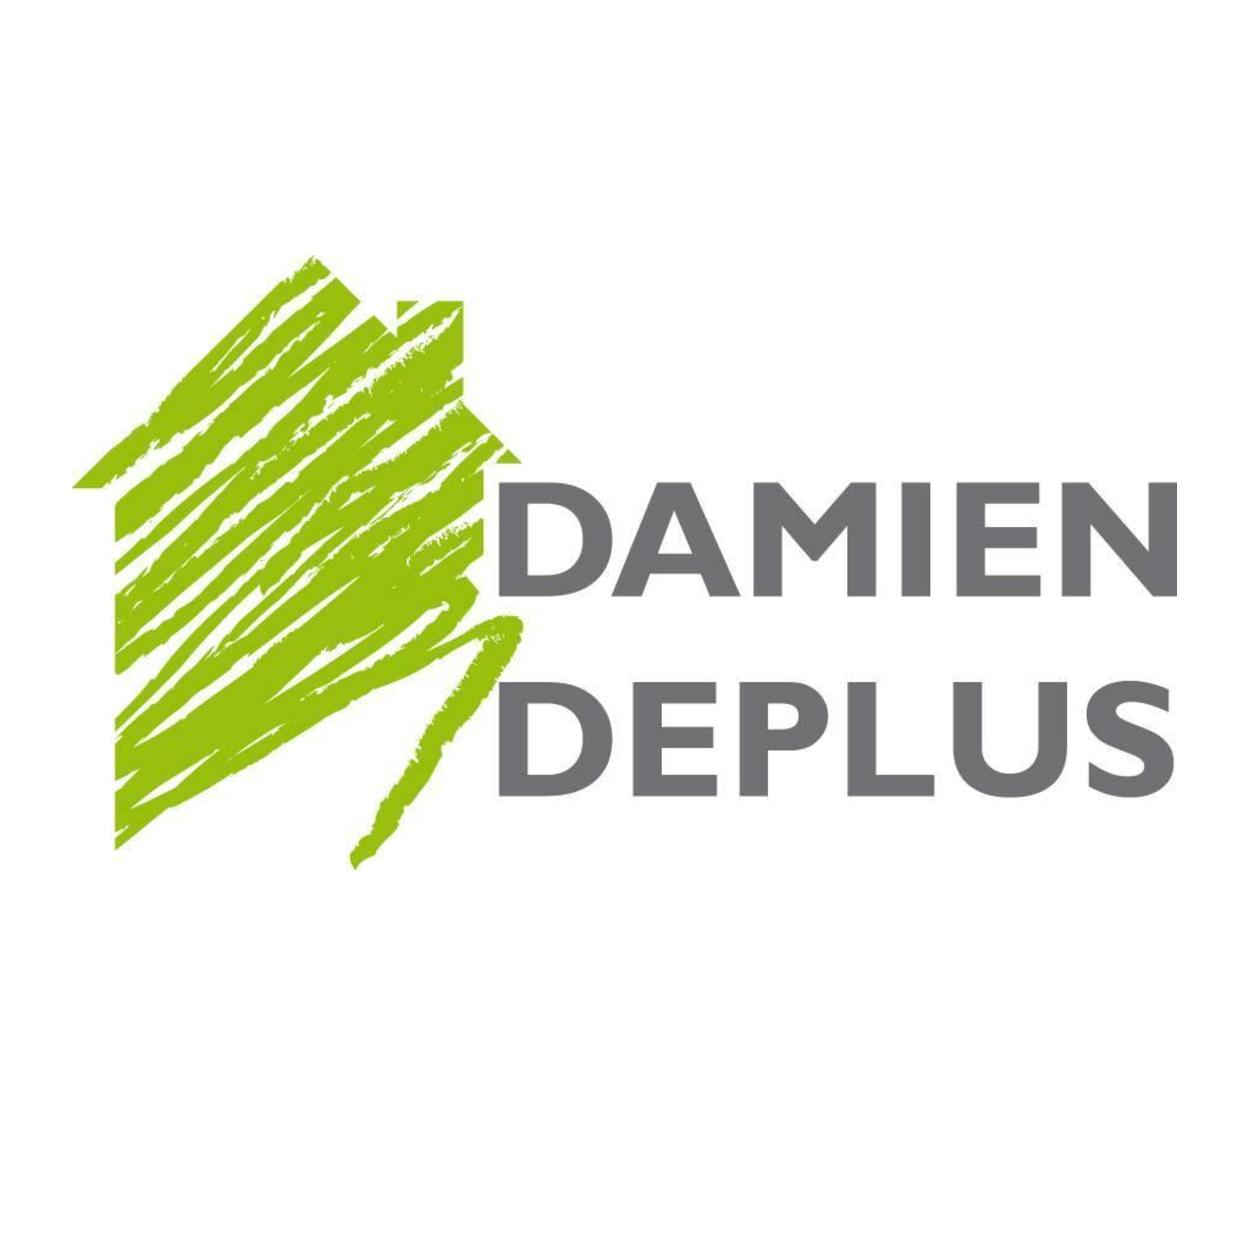 Damien Deplus